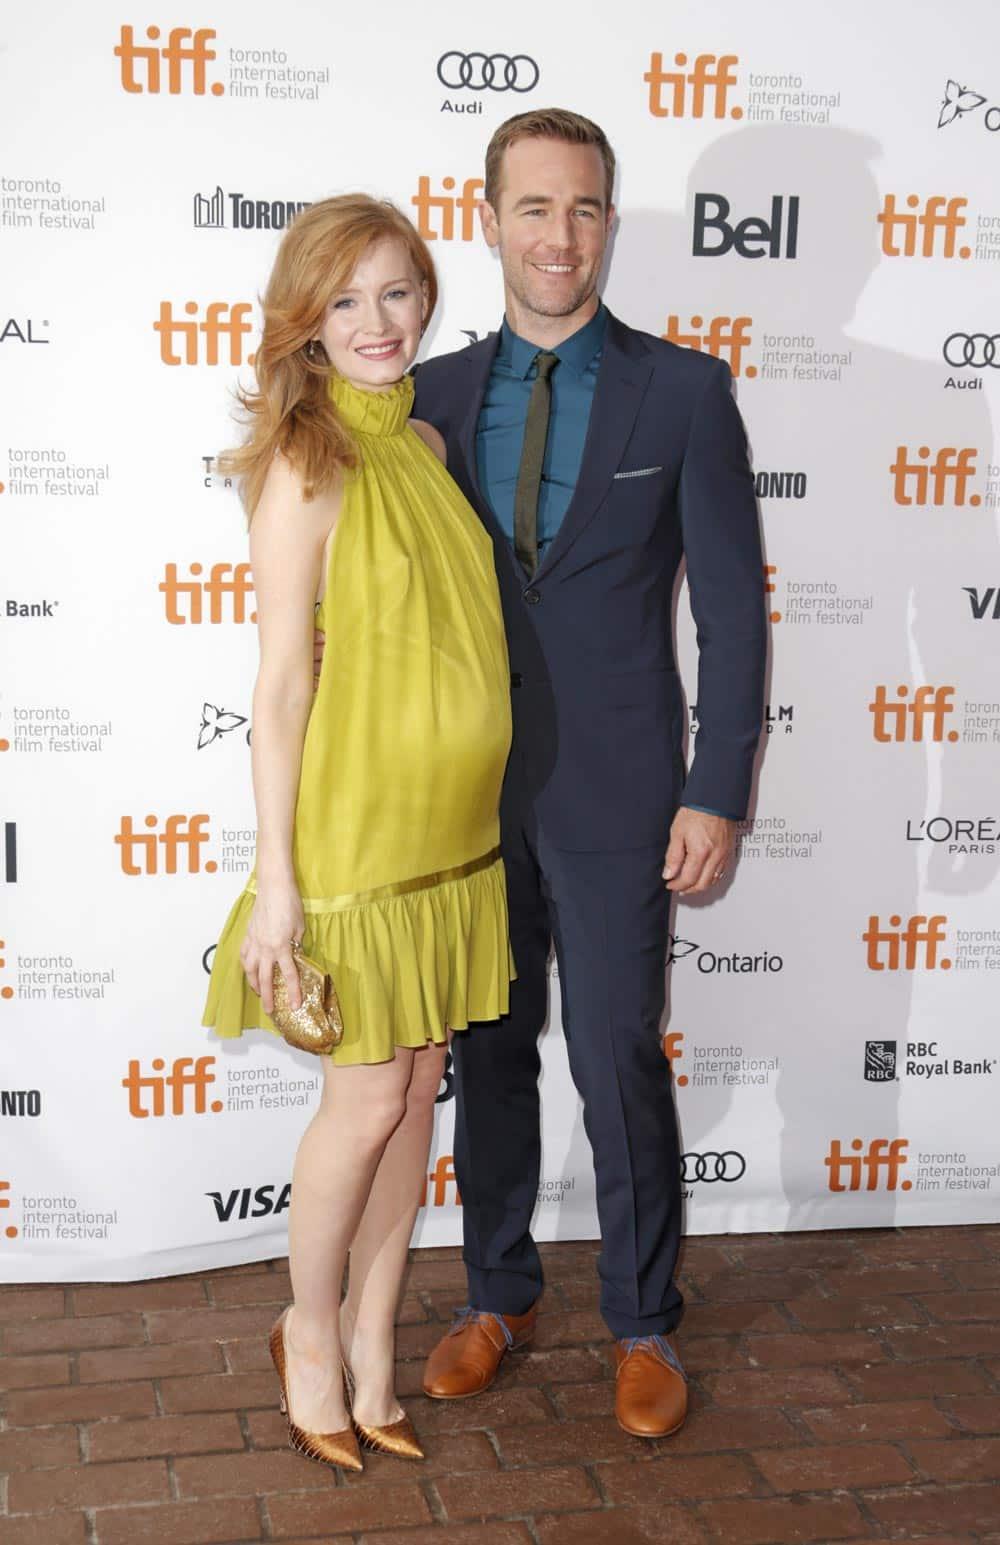 Kimberly Van Der Beek and James Van Der Beek arrive at the premiere of